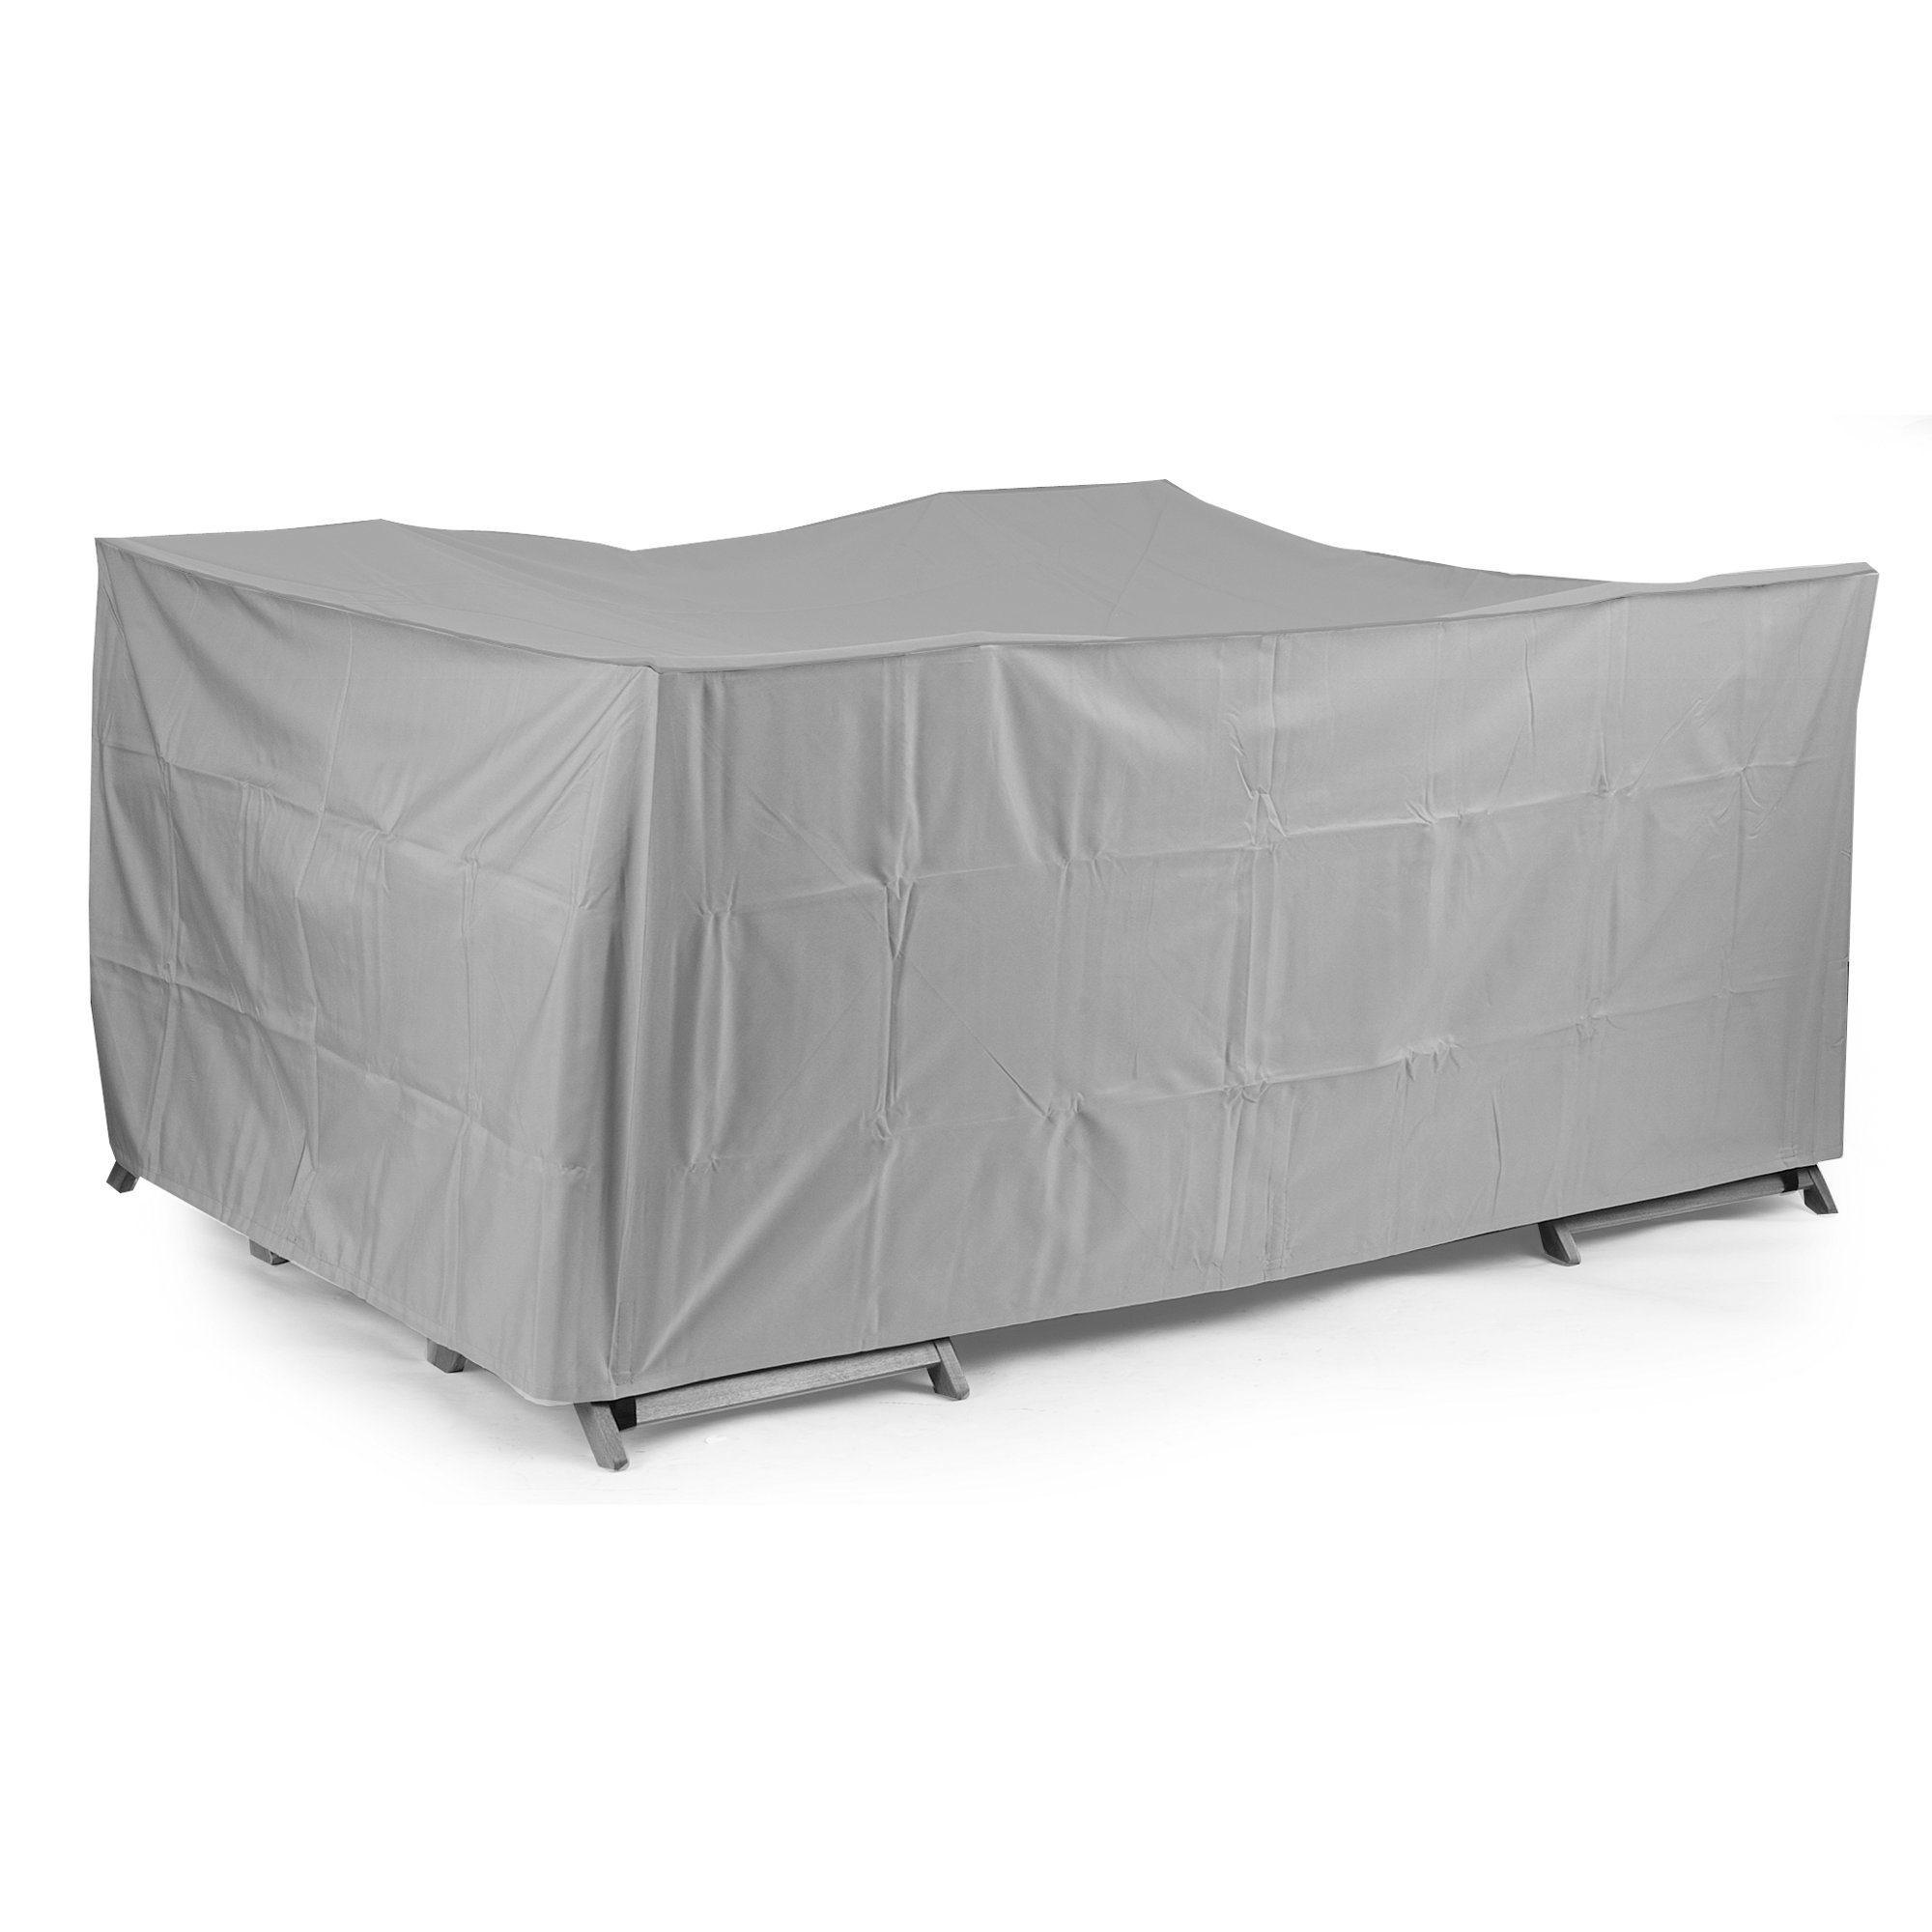 Möbelskydd 330x270 cm, höjd 65 cm